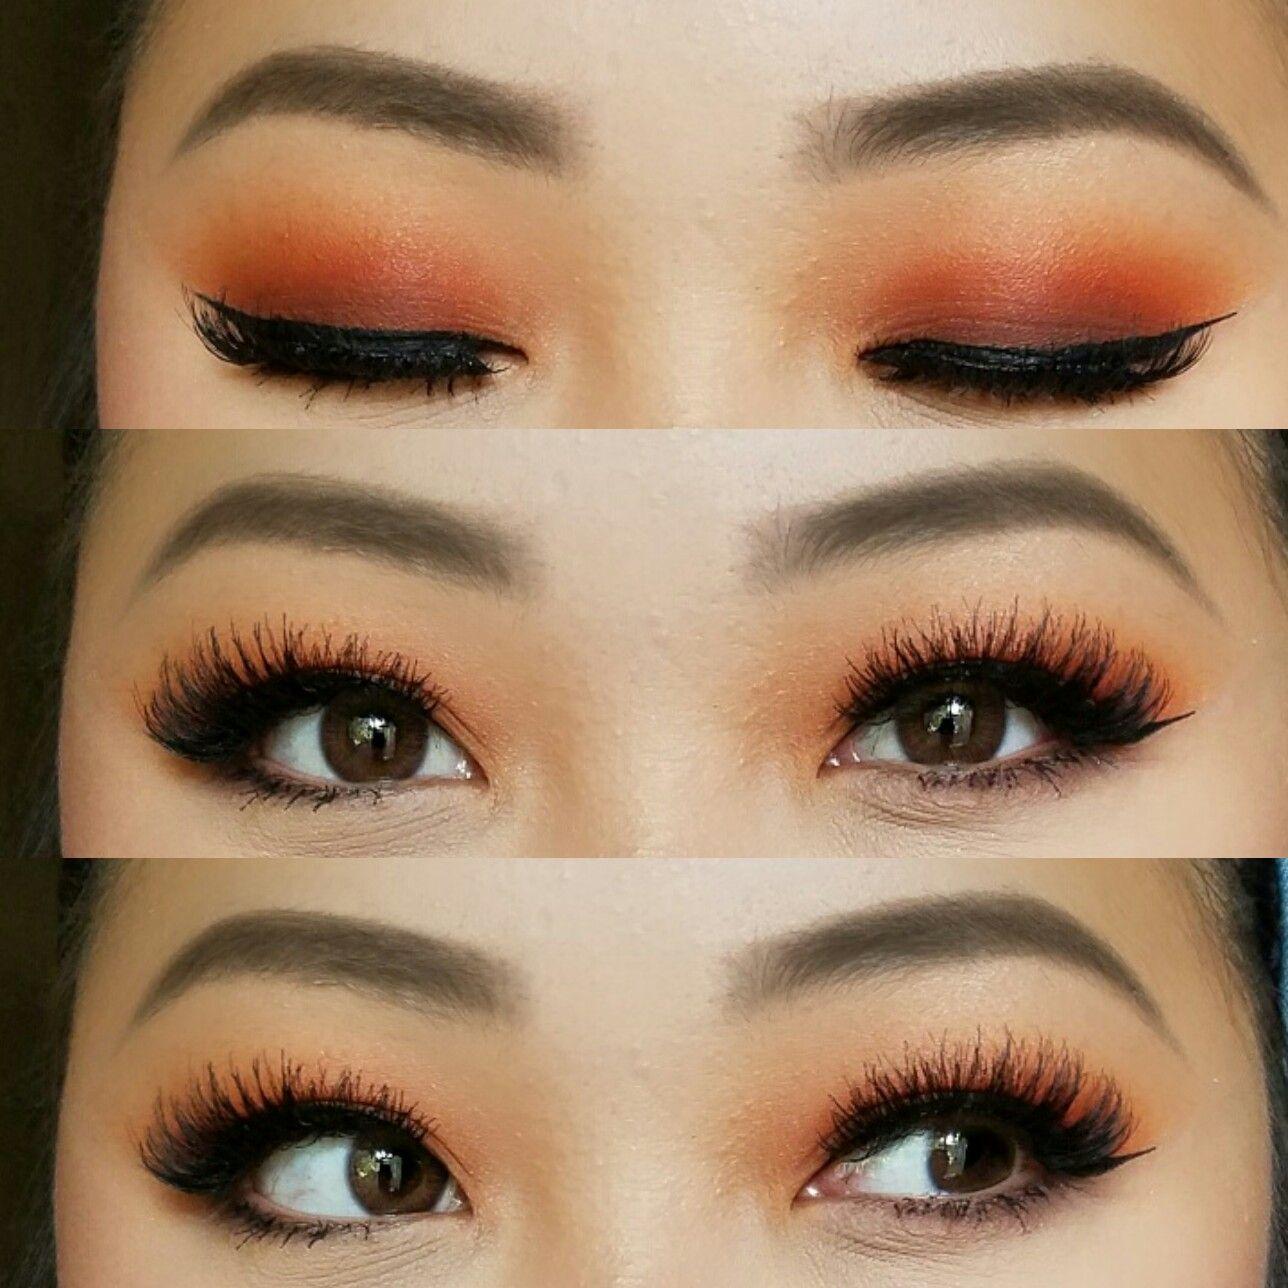 Soft smokey orange makeup. Great look for monolids. Makeup